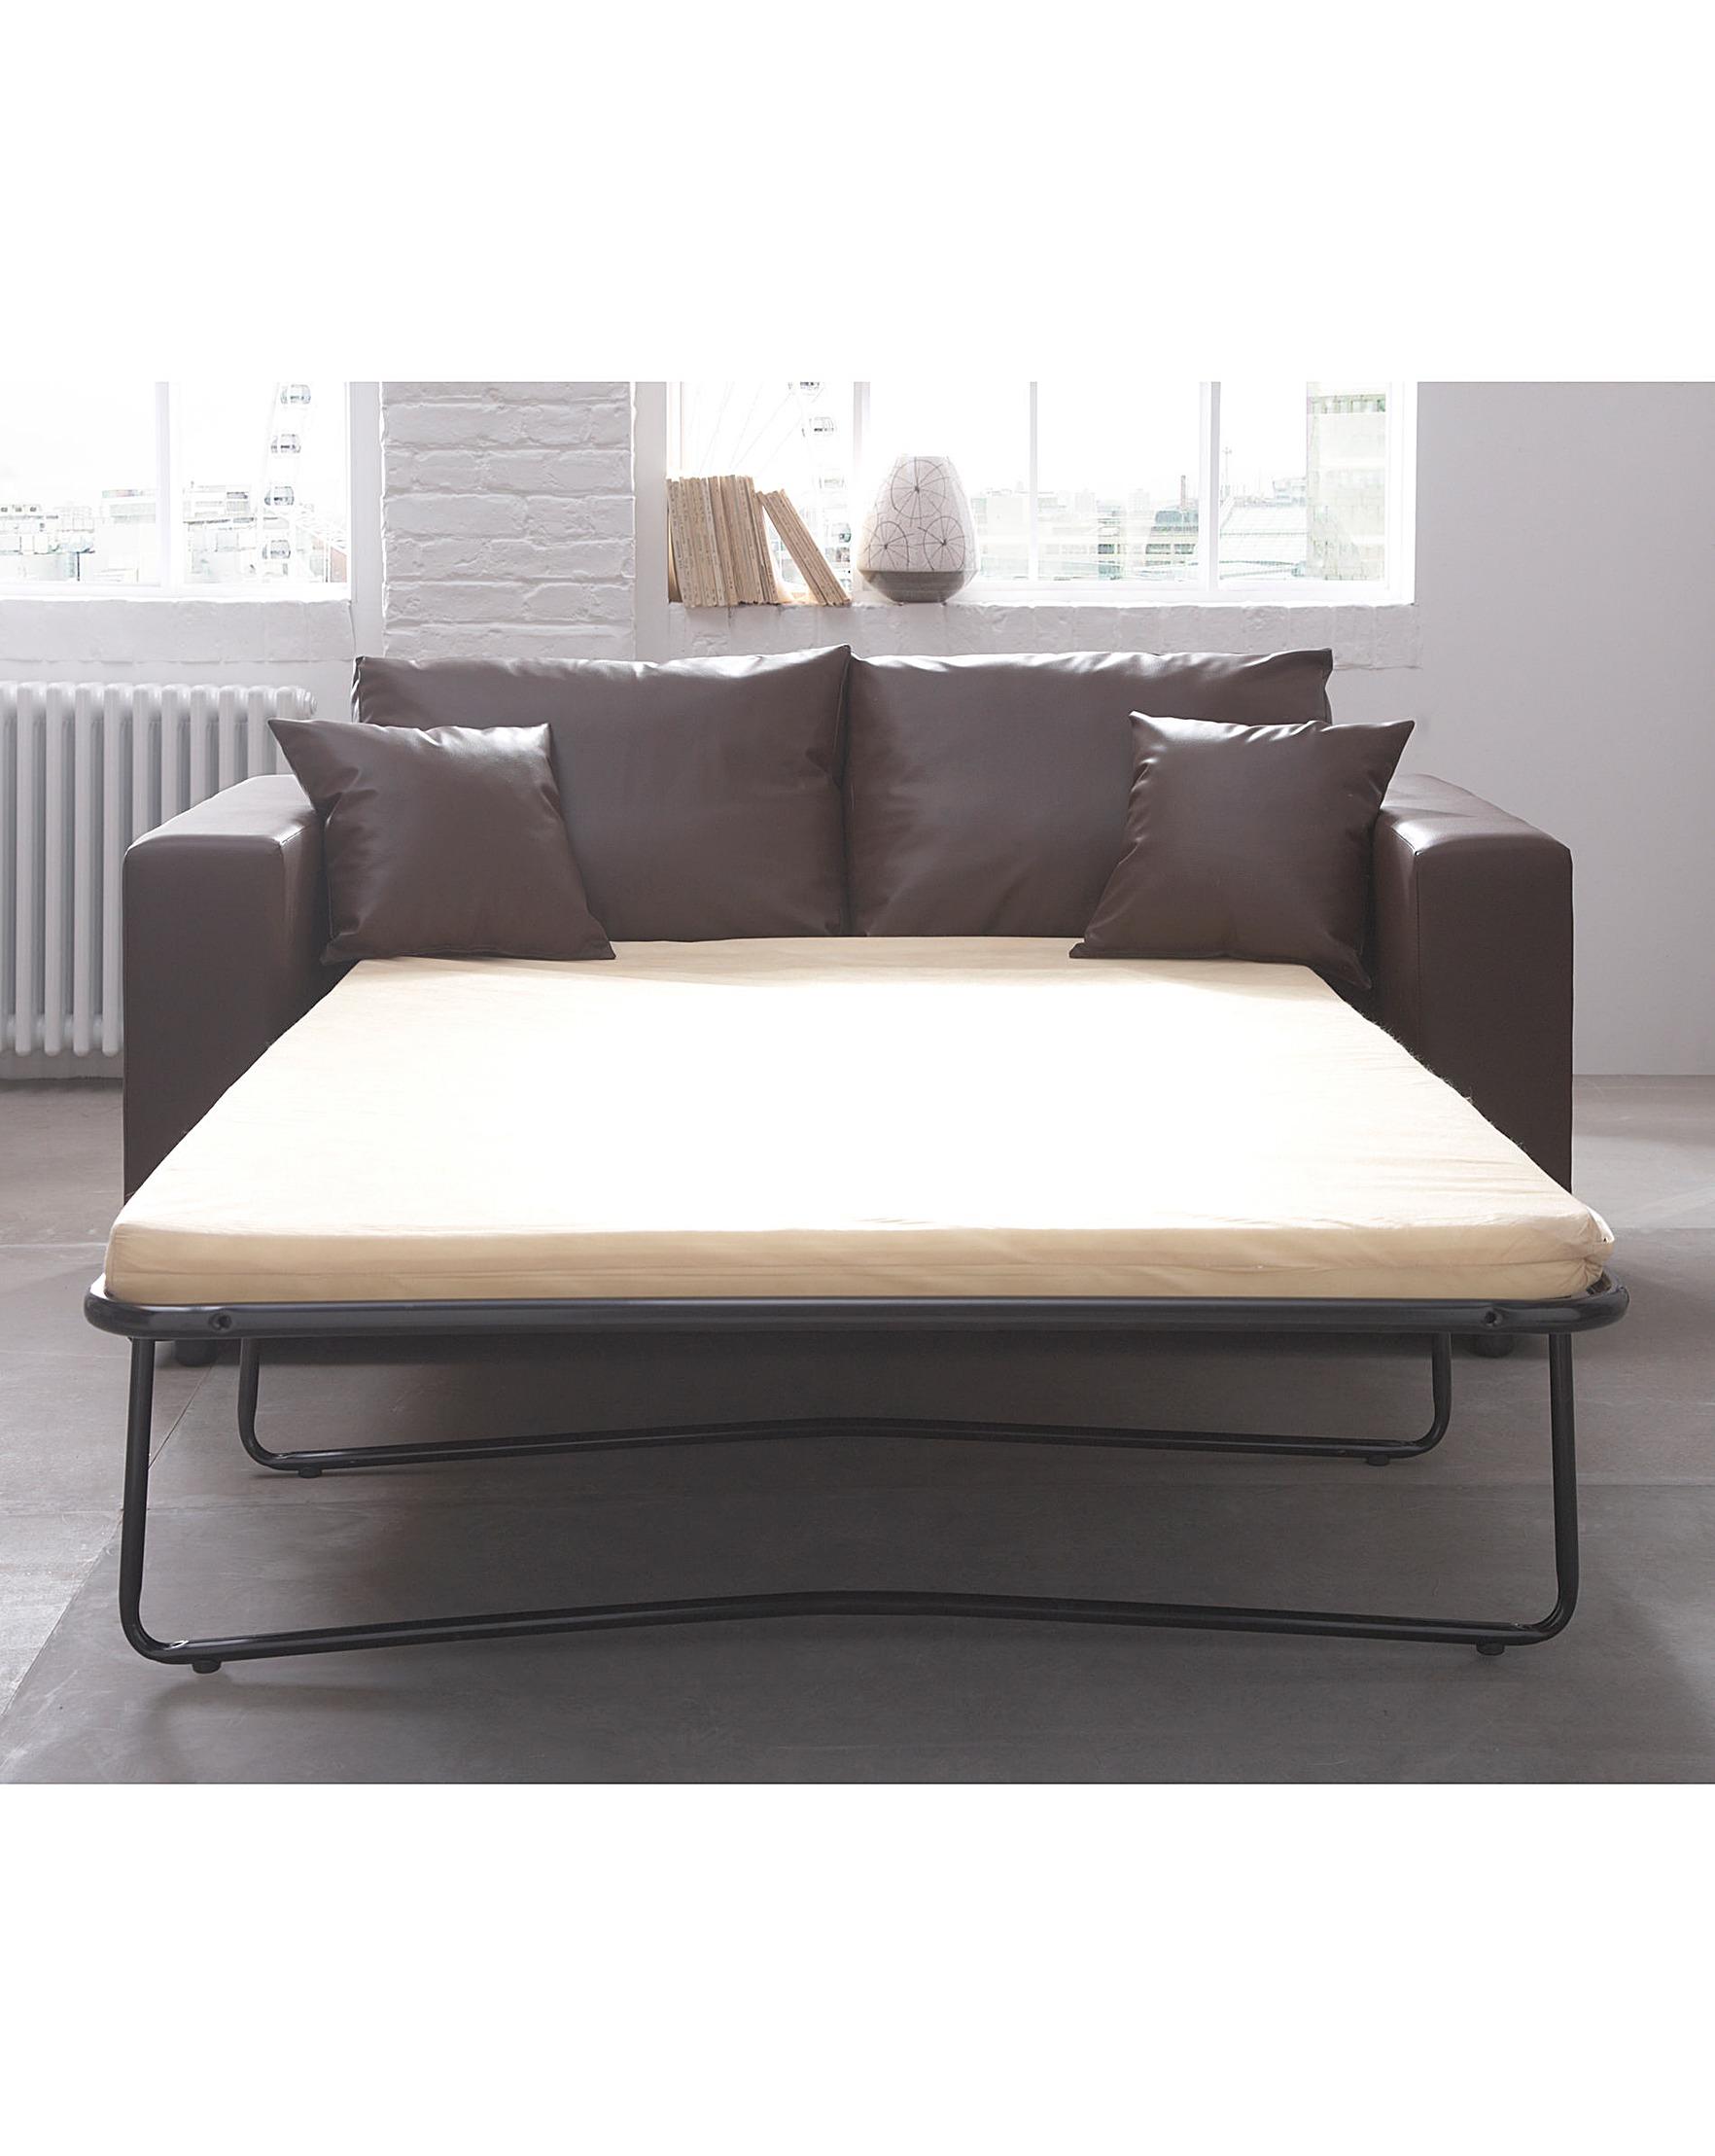 Sofa Bed Metal Modern Three Seater Silver Metal Futon Sofa